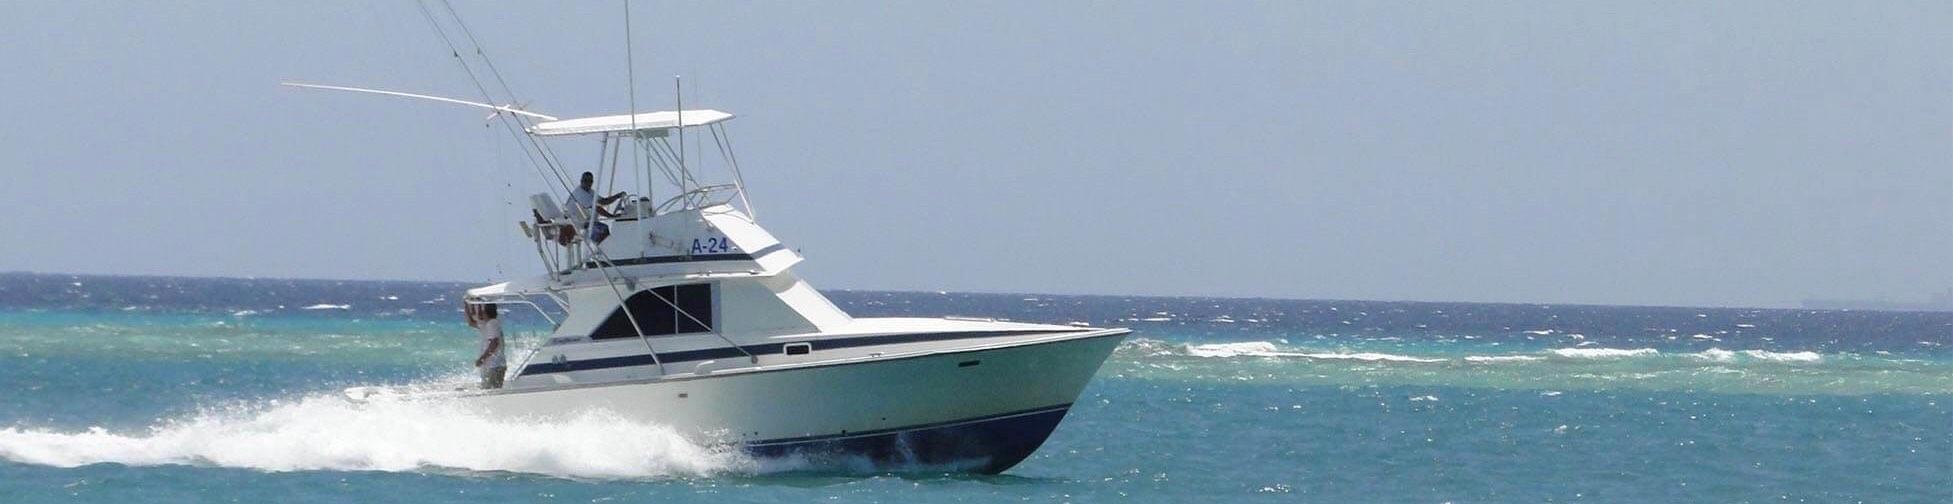 Sea-Fishing-Malindi-Kenya-Coast-Driftwoo